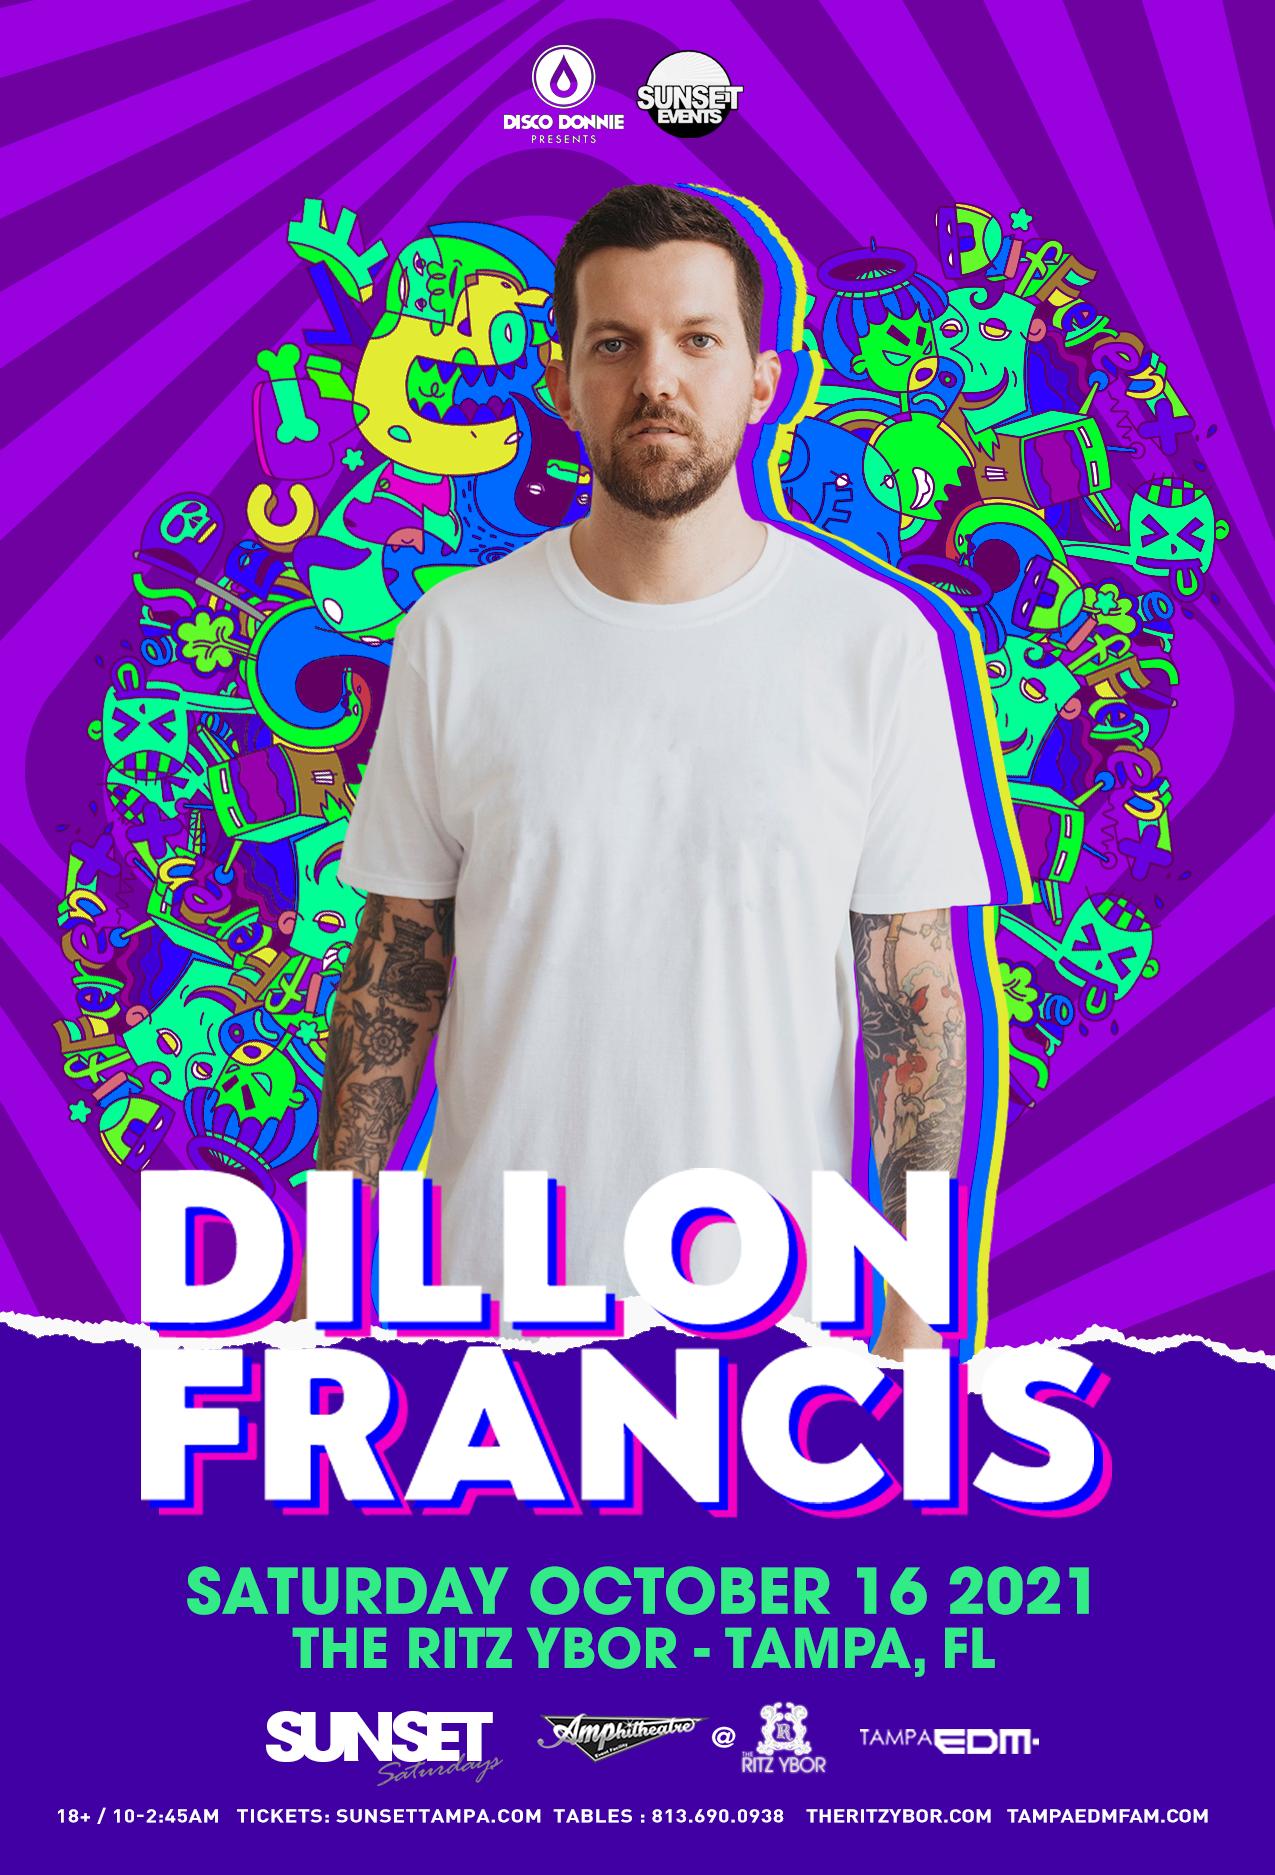 Dillon Francis for Sunset Saturdays at The RITZ Ybor – 10/16/2021